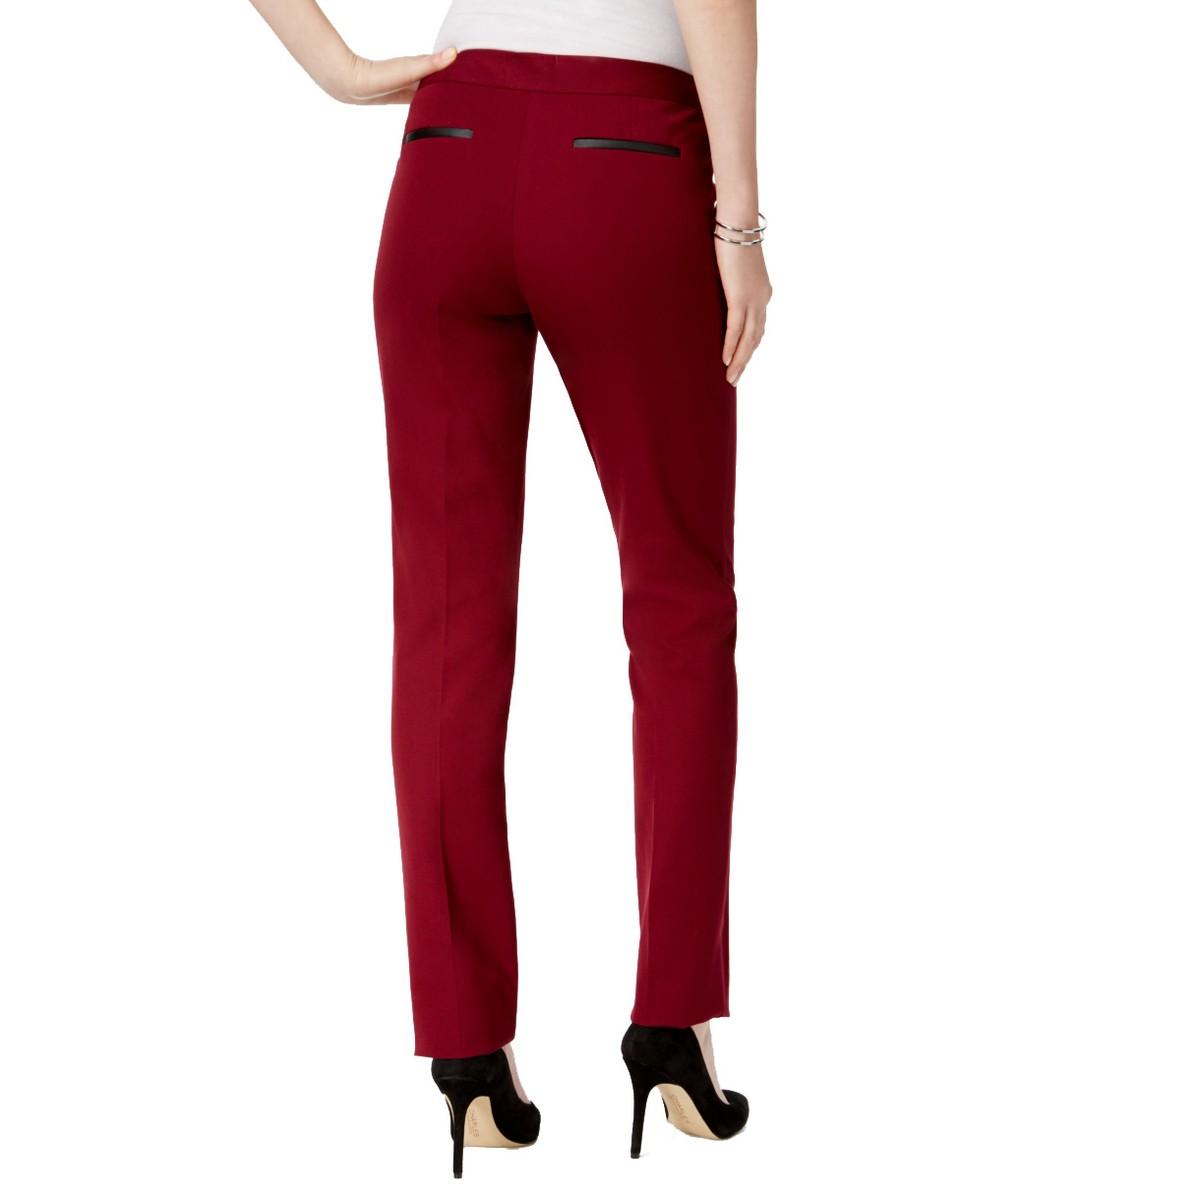 ALFANI-NEW-Women-039-s-Tummy-Control-Short-Length-Slim-Leg-Pants-TEDO thumbnail 6